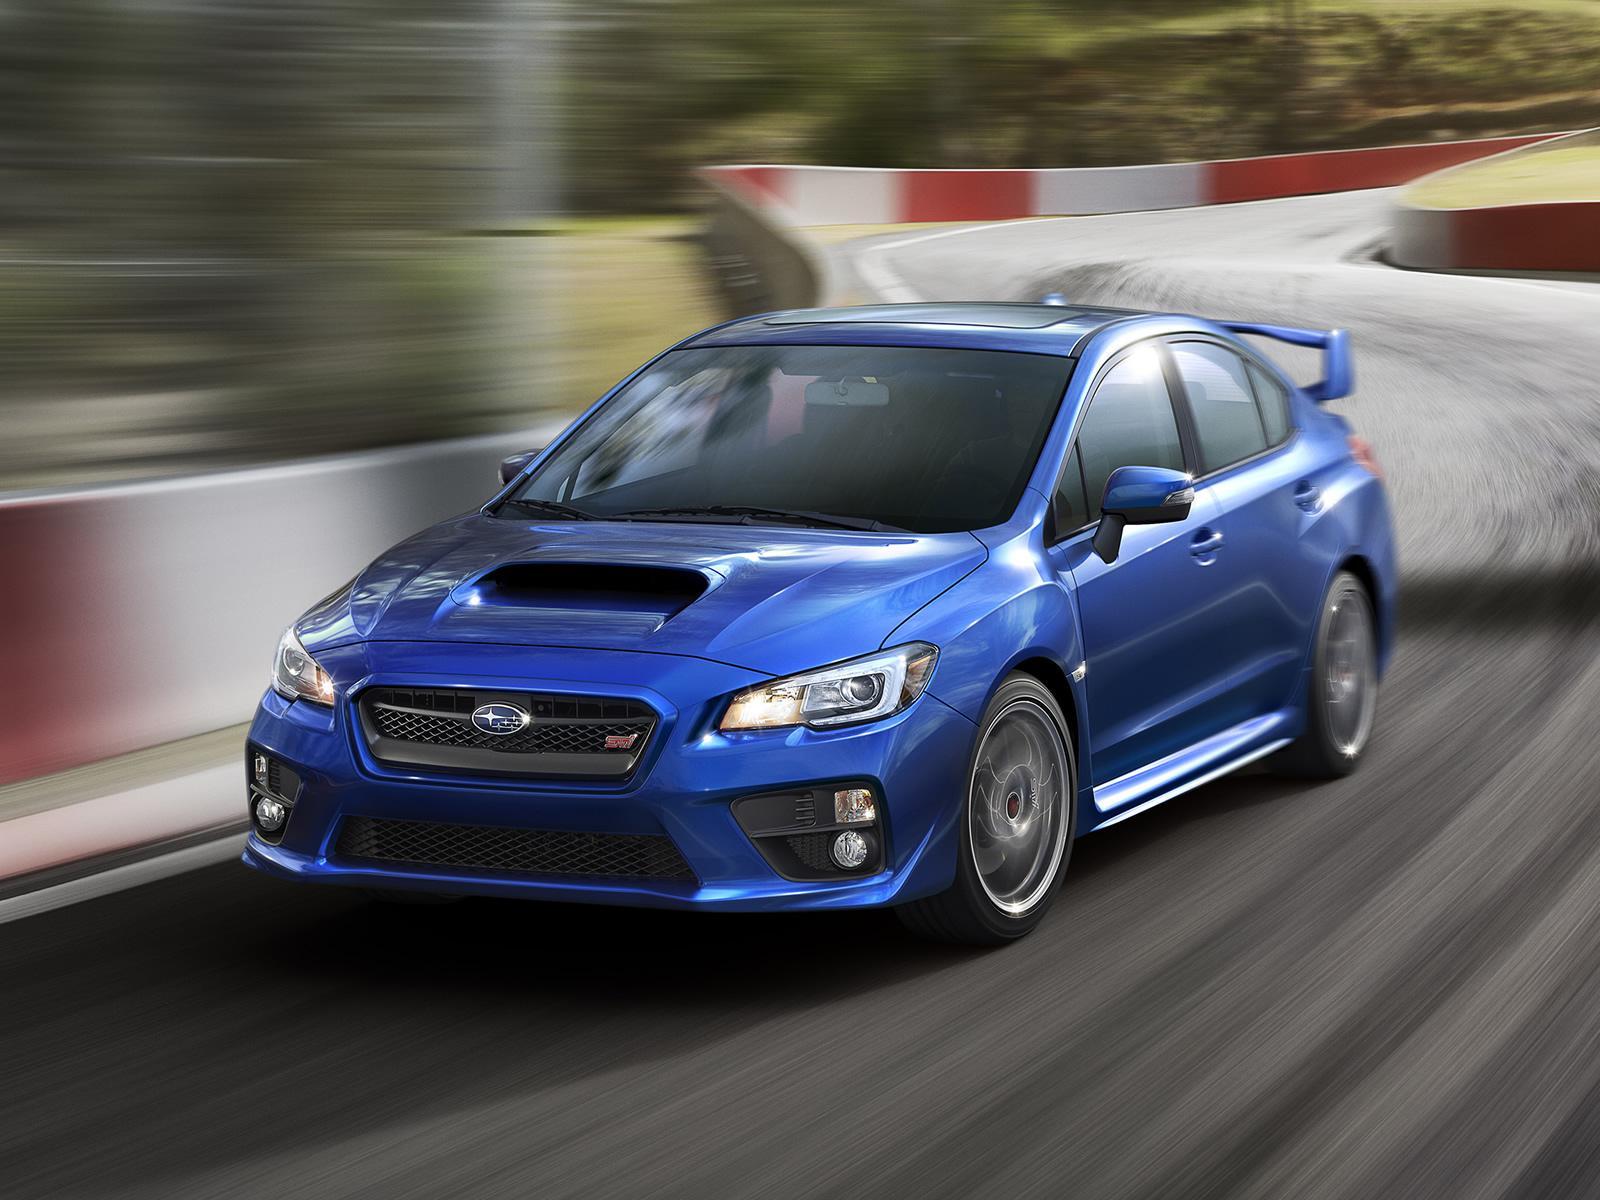 Subaru Cars News 2015 Wrx Sti Officially Revealed